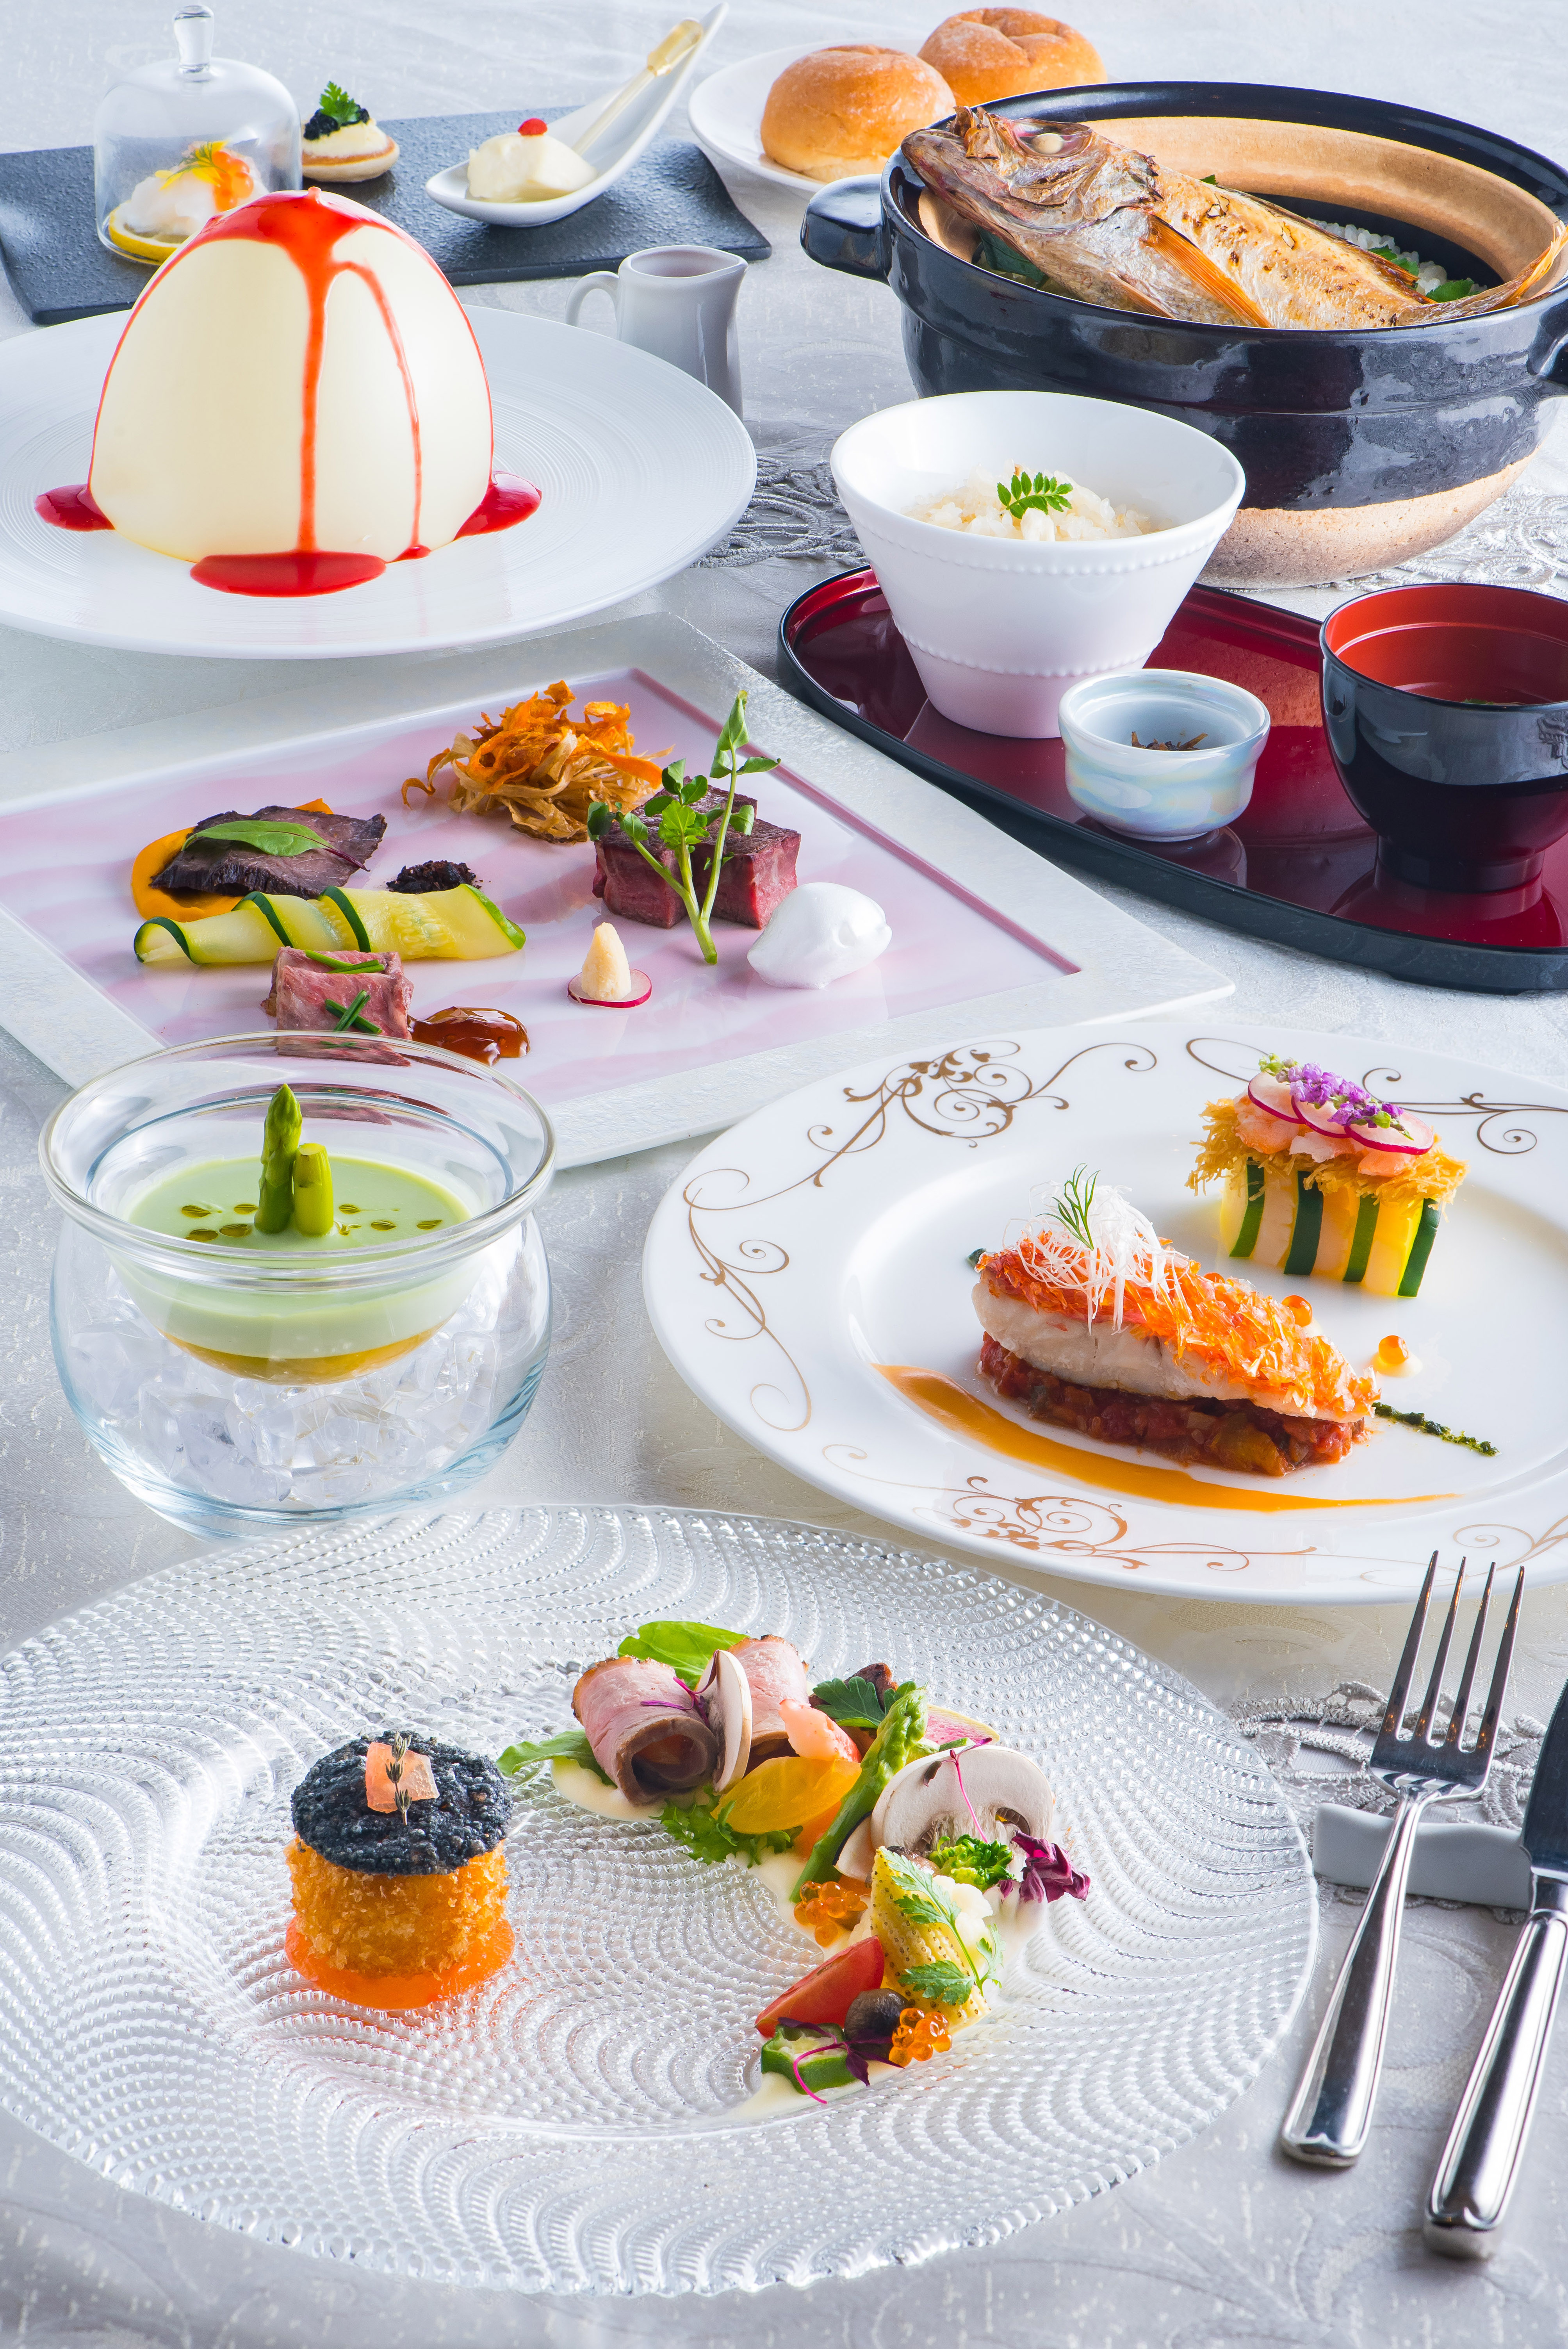 NEW! 婚礼料理 | 愛媛県松山市の結婚式場ベルフォーレ松山